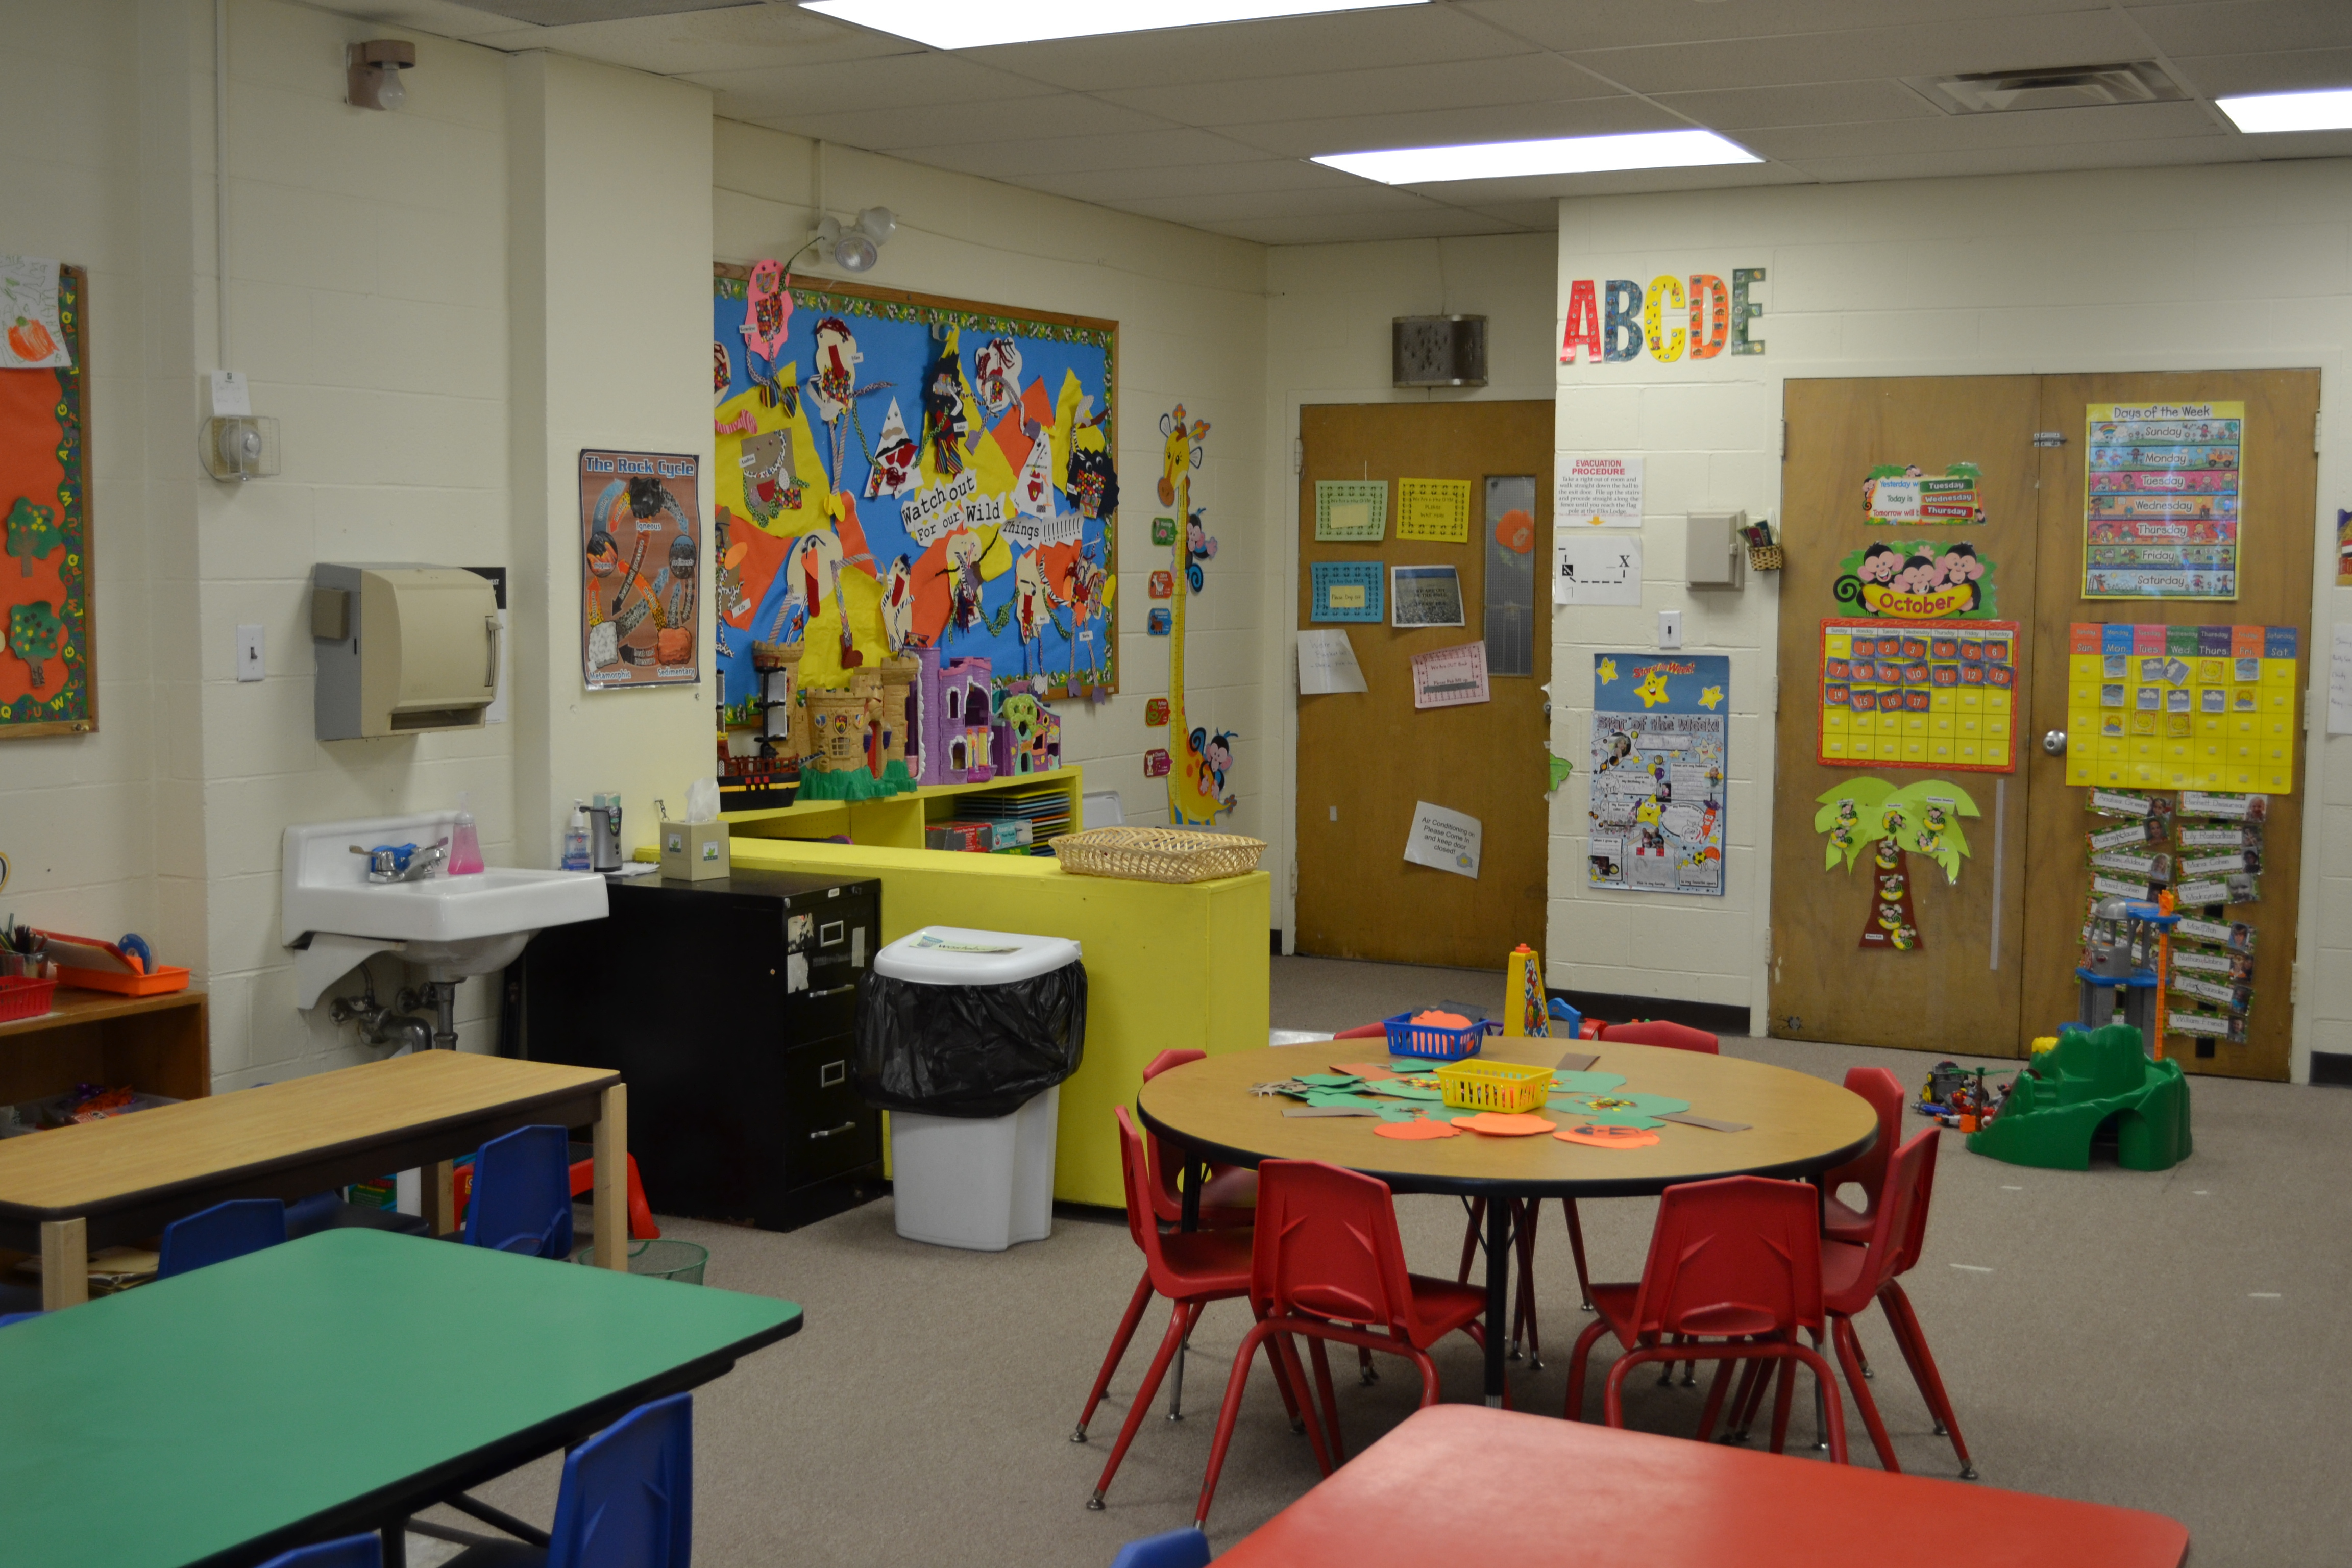 arlington ma preschool abc preschool 975